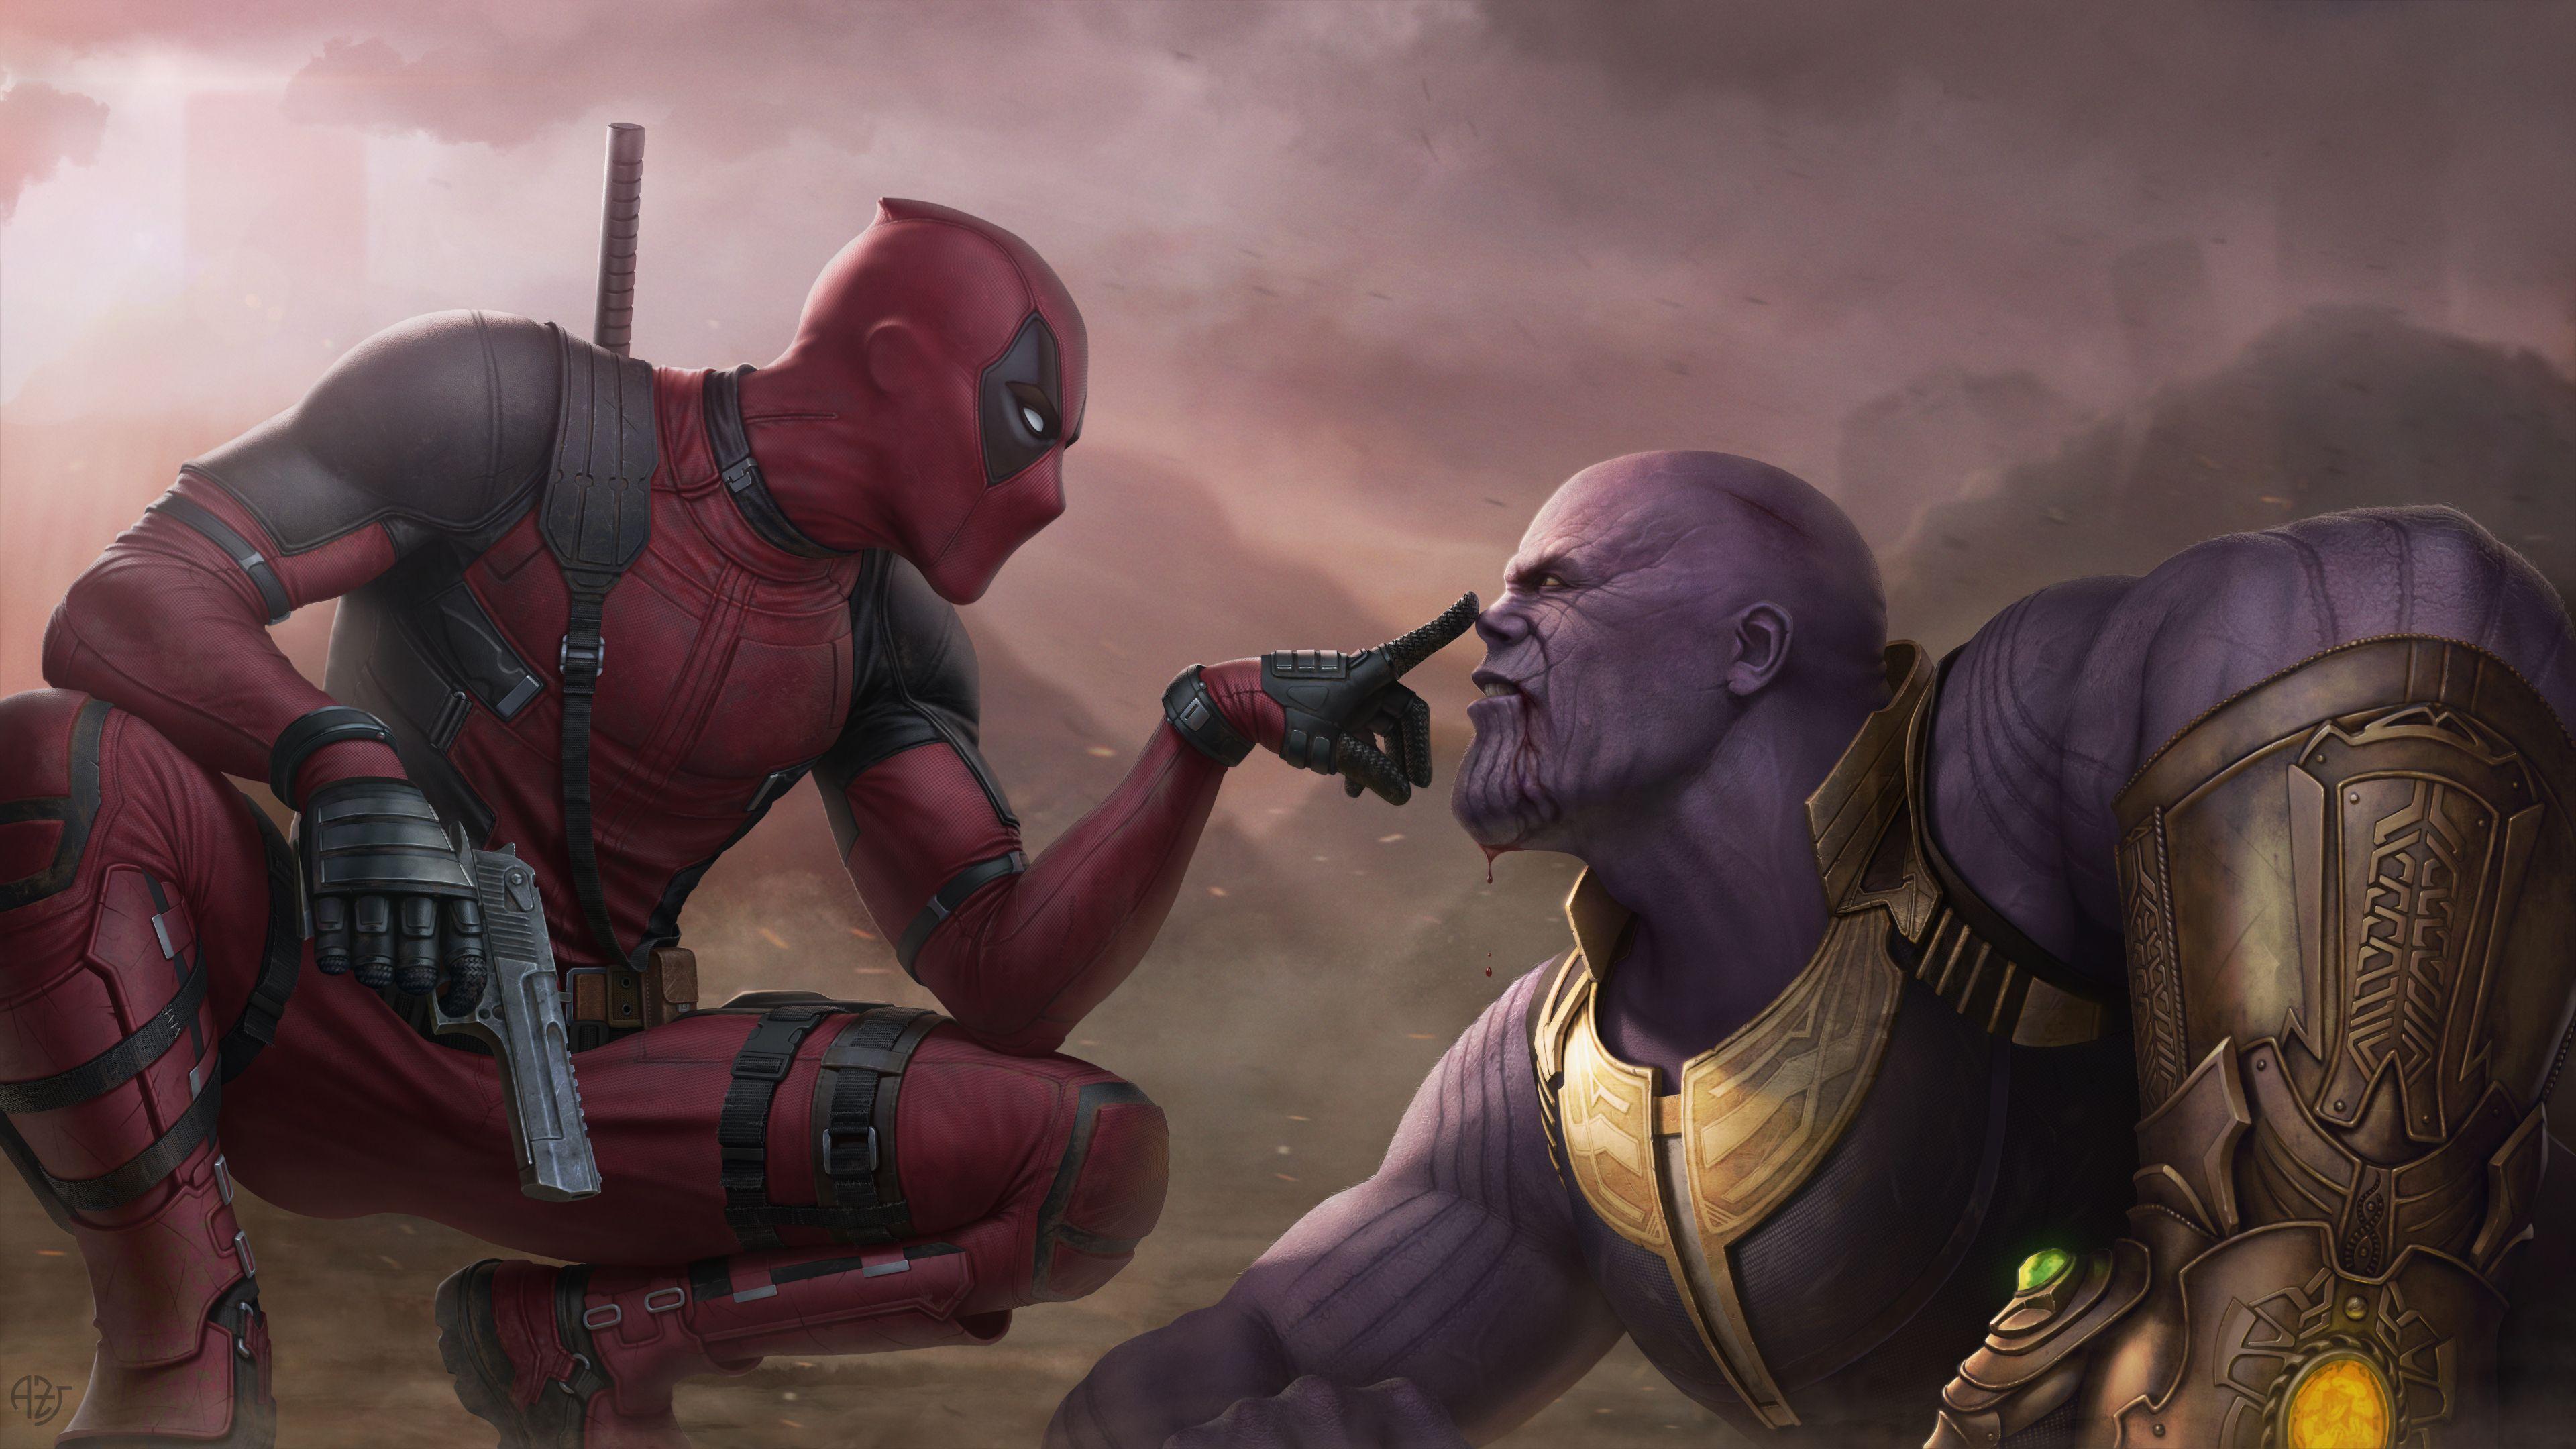 download Deadpool Vs Thanos 4k thanos wallpapers supervillain 3840x2160